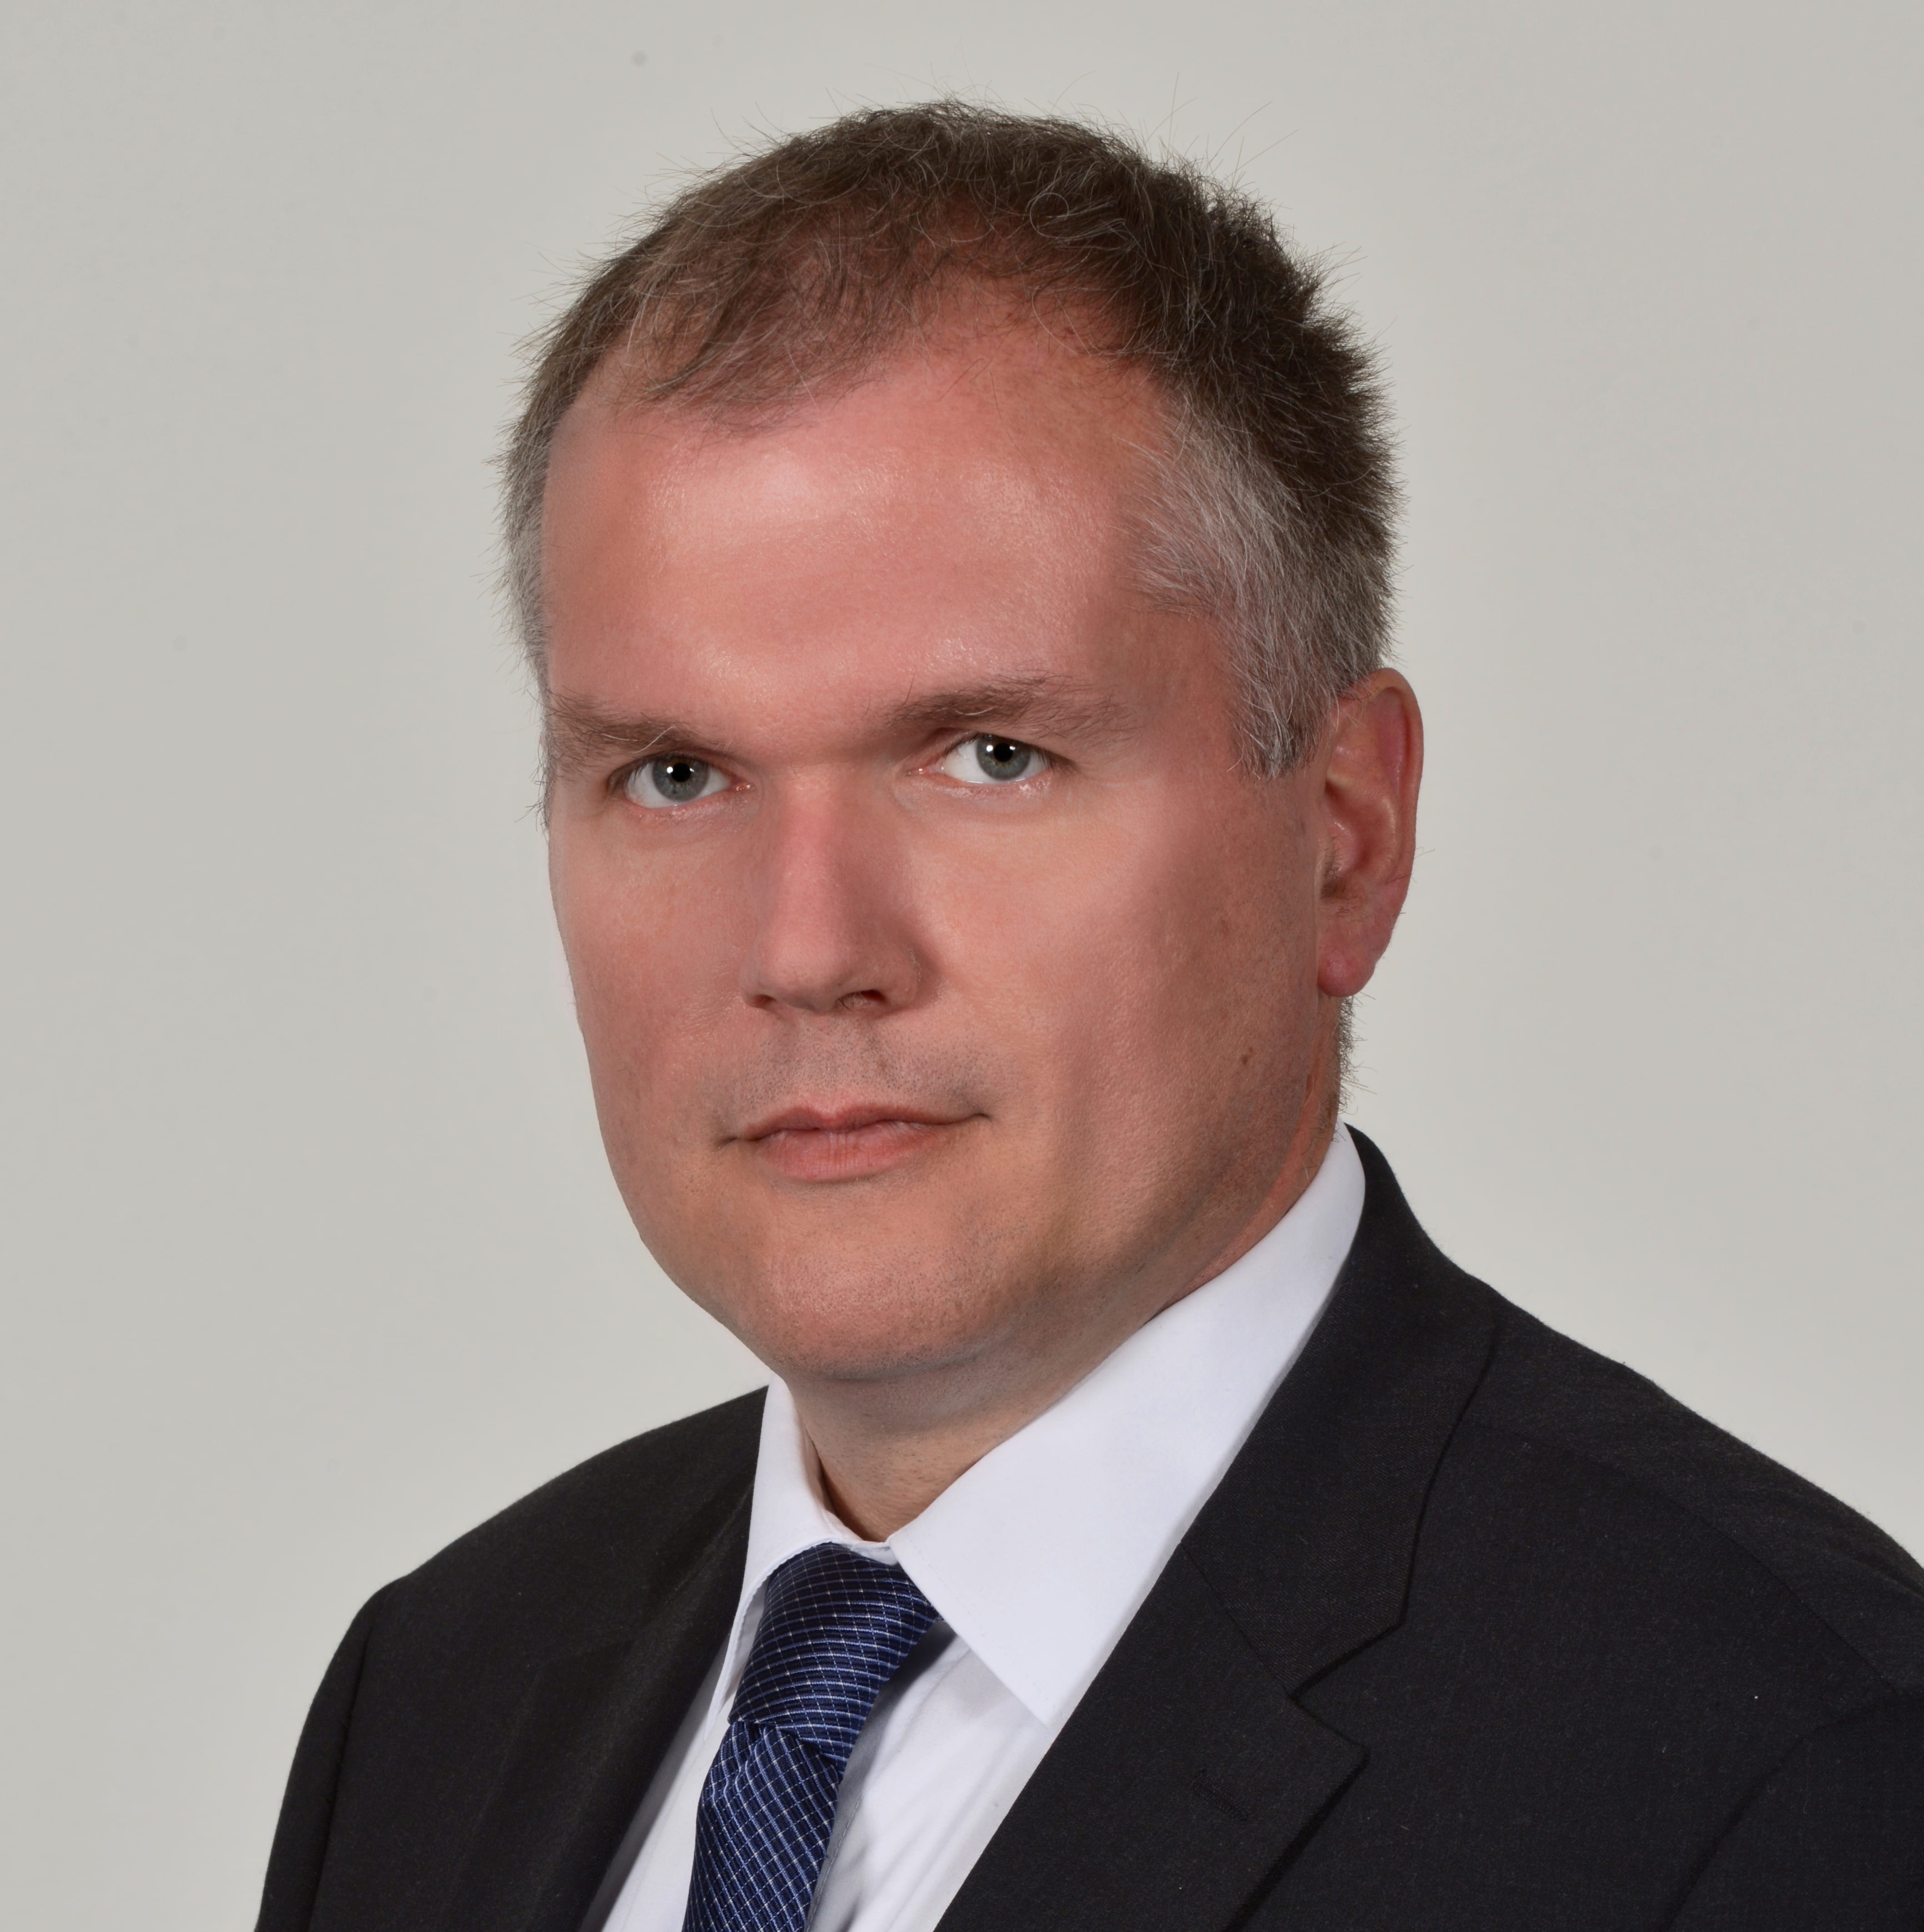 Ravnatelj CARNET-a Goran Kezunović